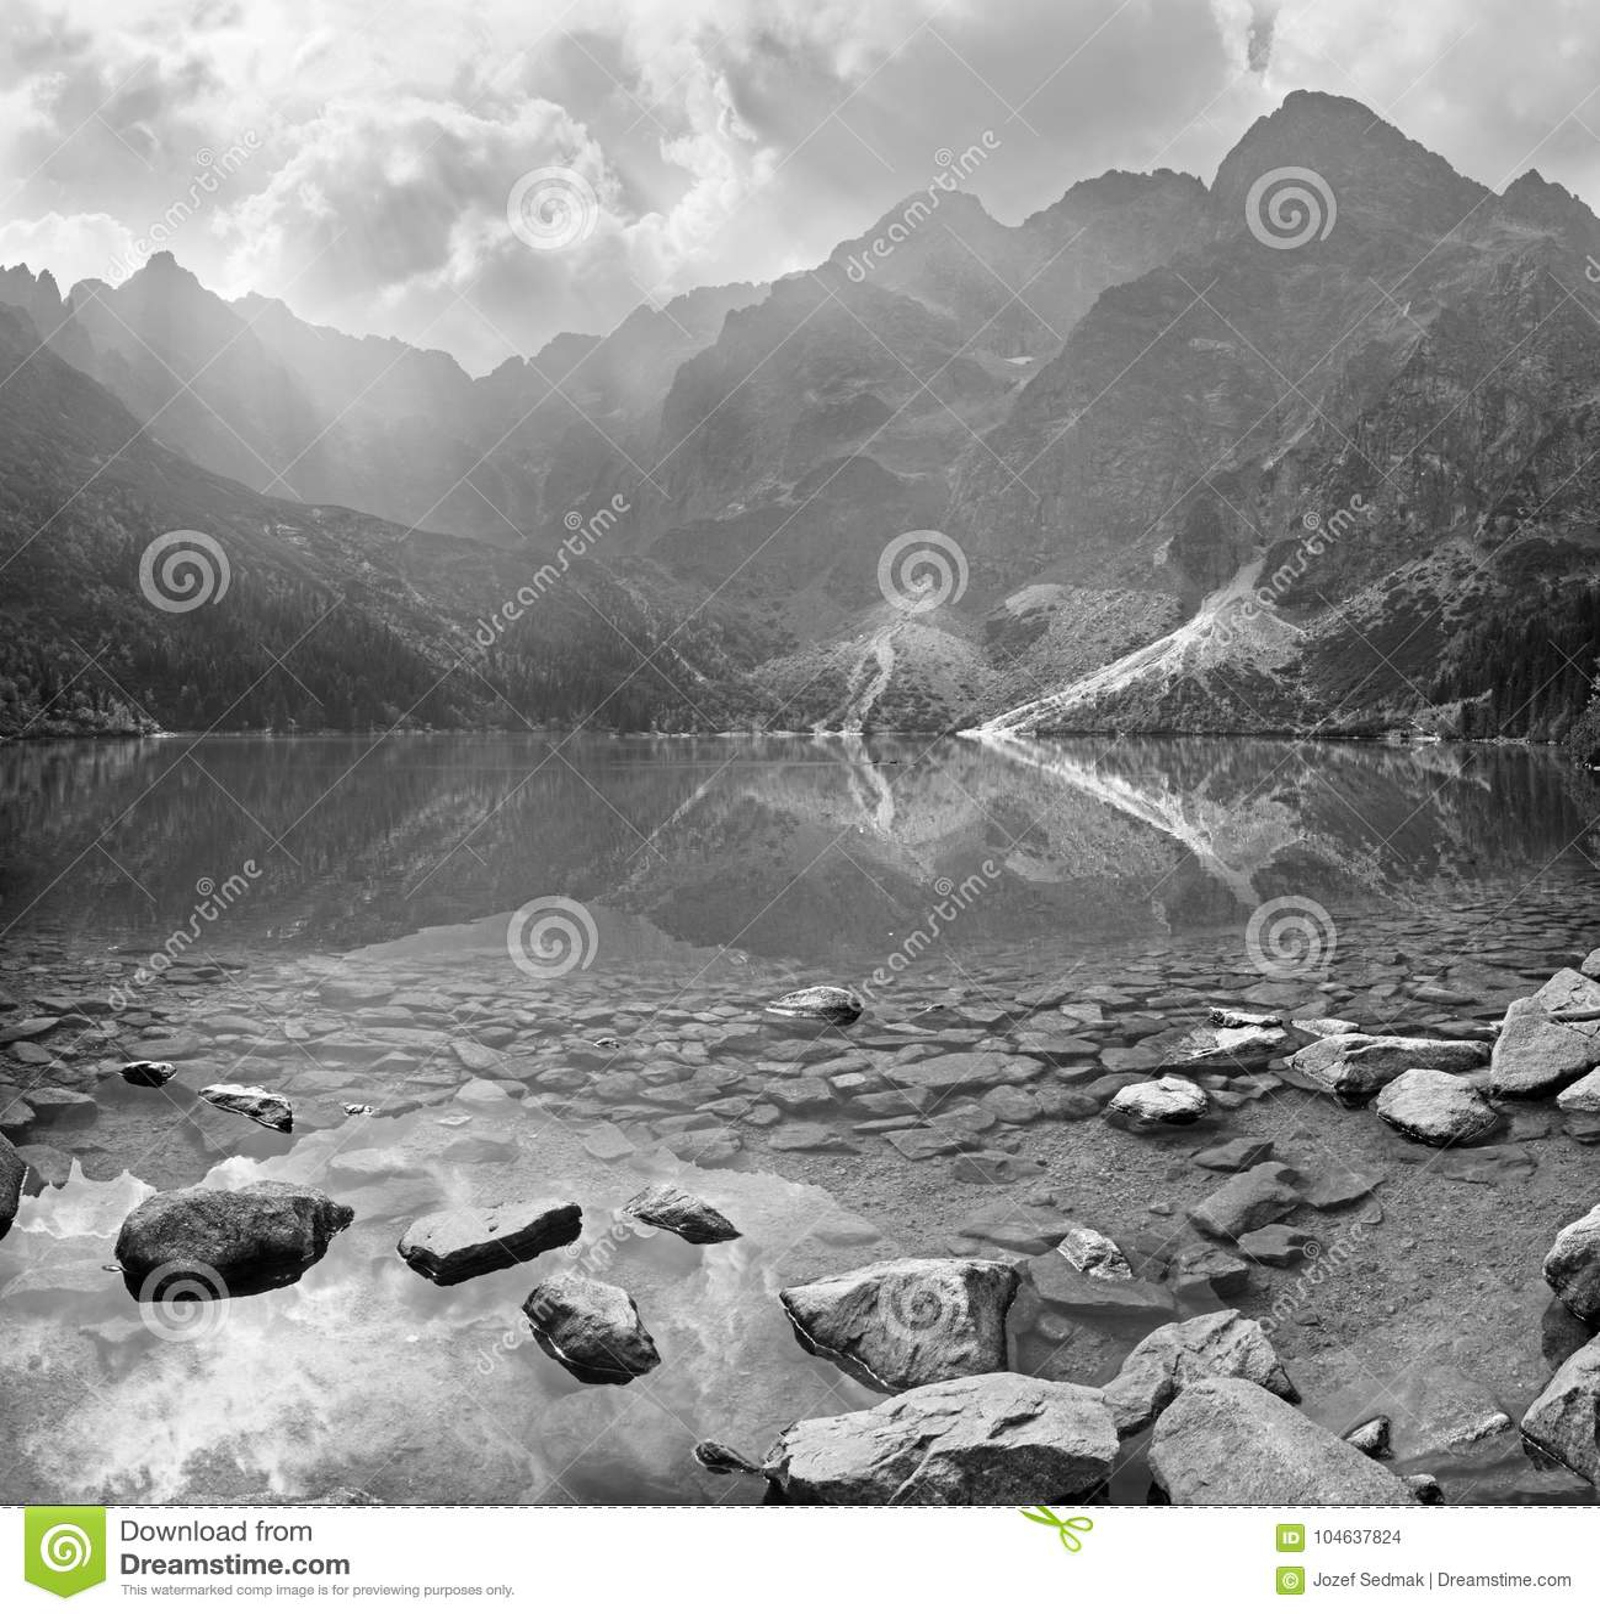 Download Hoge Tatras - Het Meer Morskie Oko En Rysy, Mengusovske En Andere Pieken Stock Foto - Afbeelding bestaande uit landschap, alpinisme: 104637824